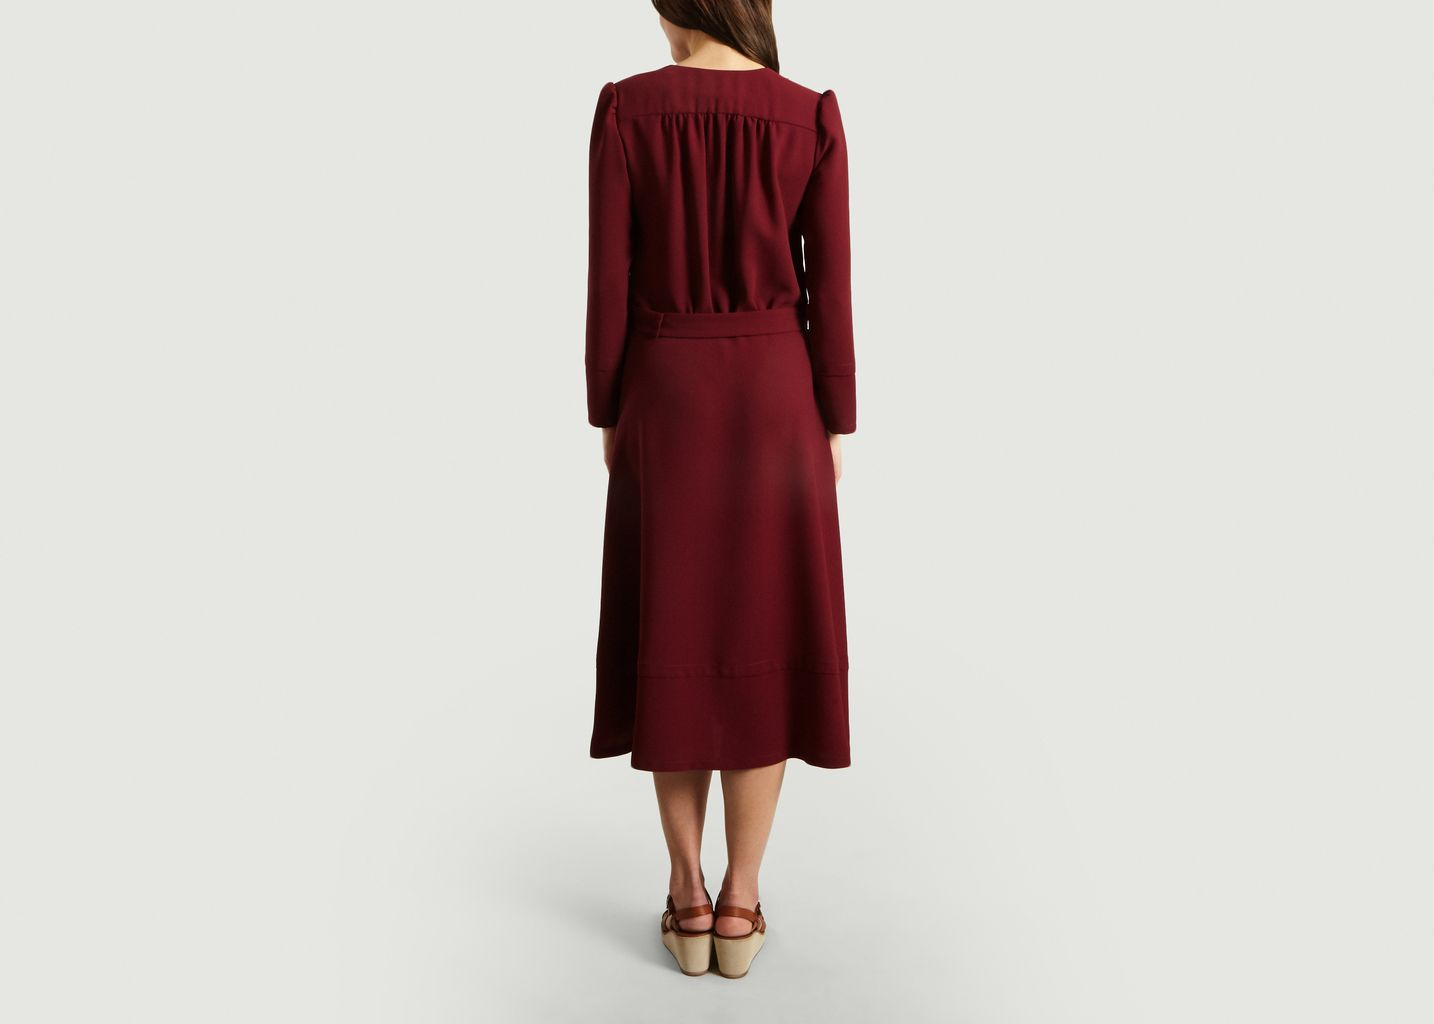 Robe Bing - A.P.C.